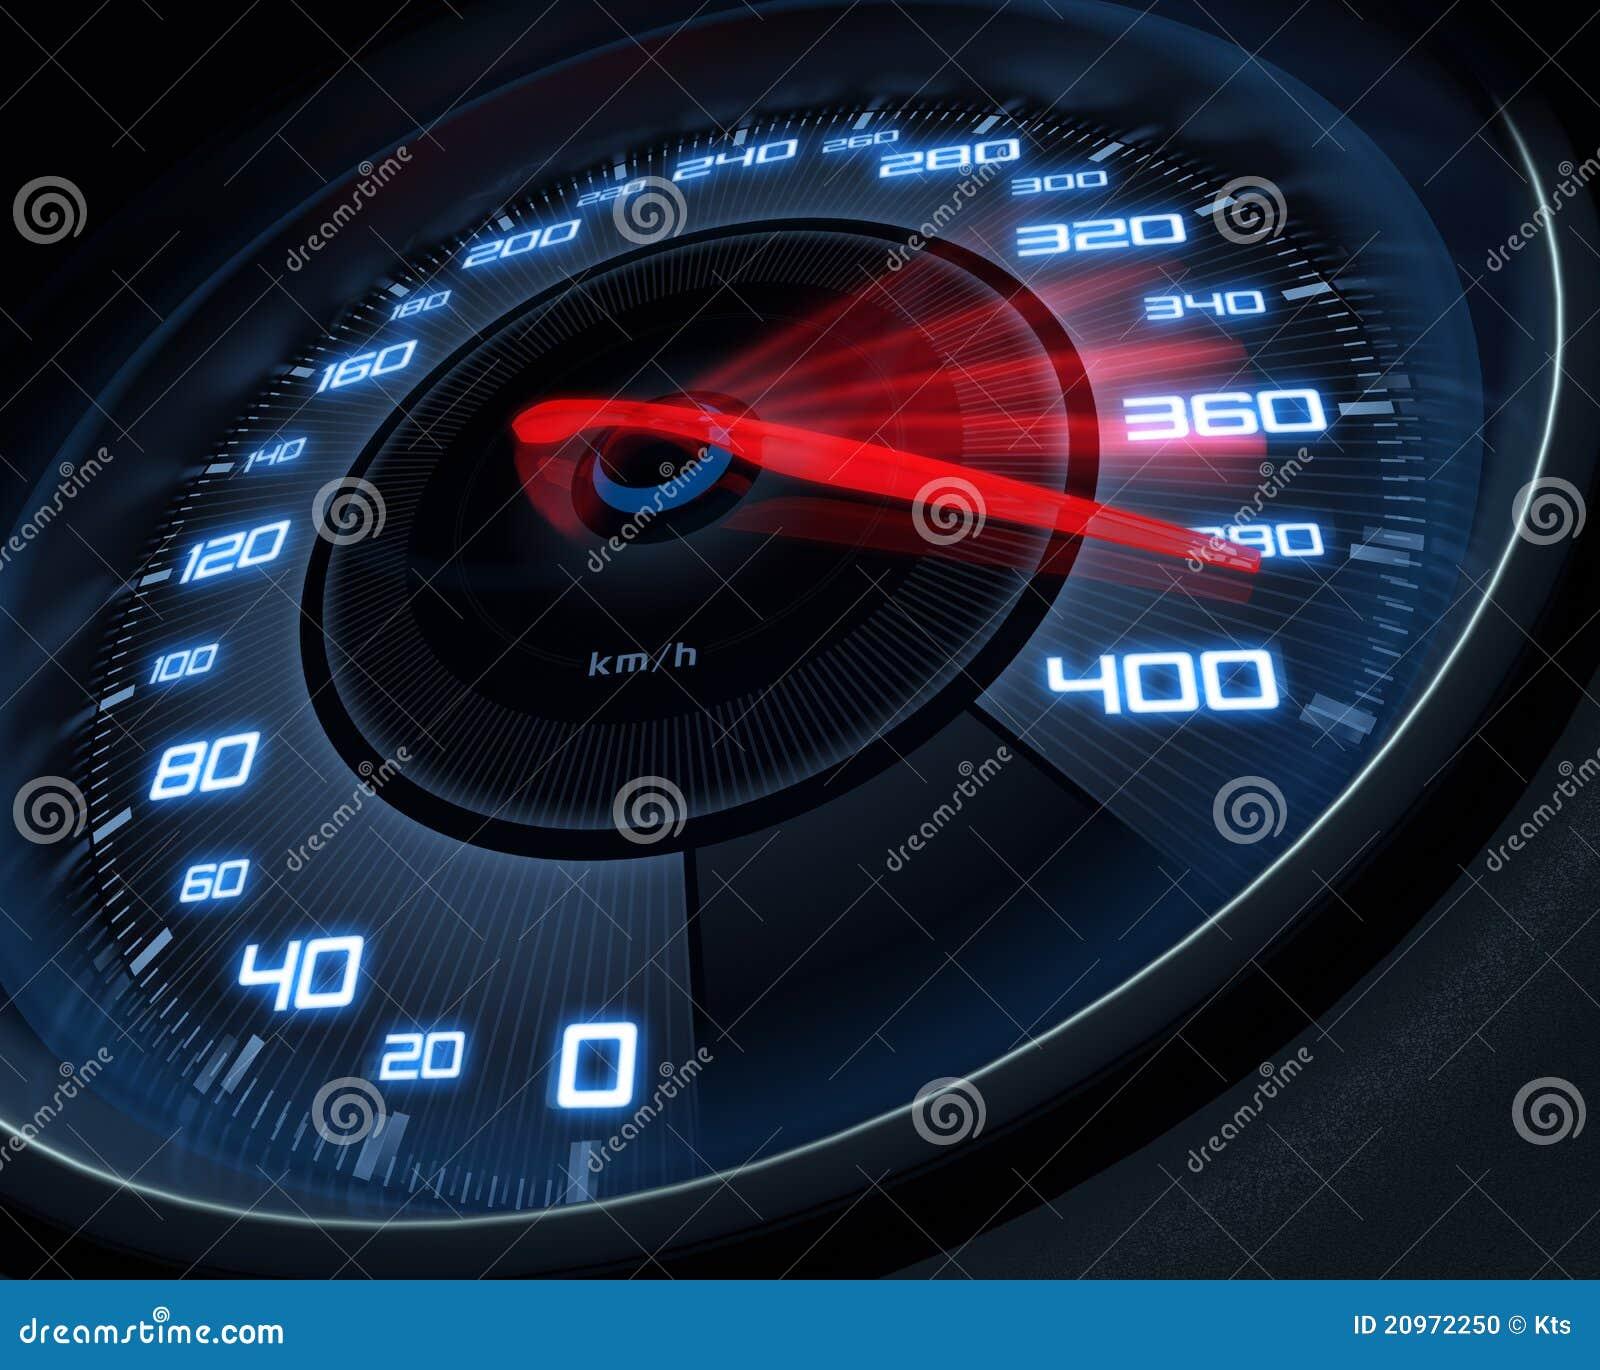 High Speed Stock Photo Image 20972250